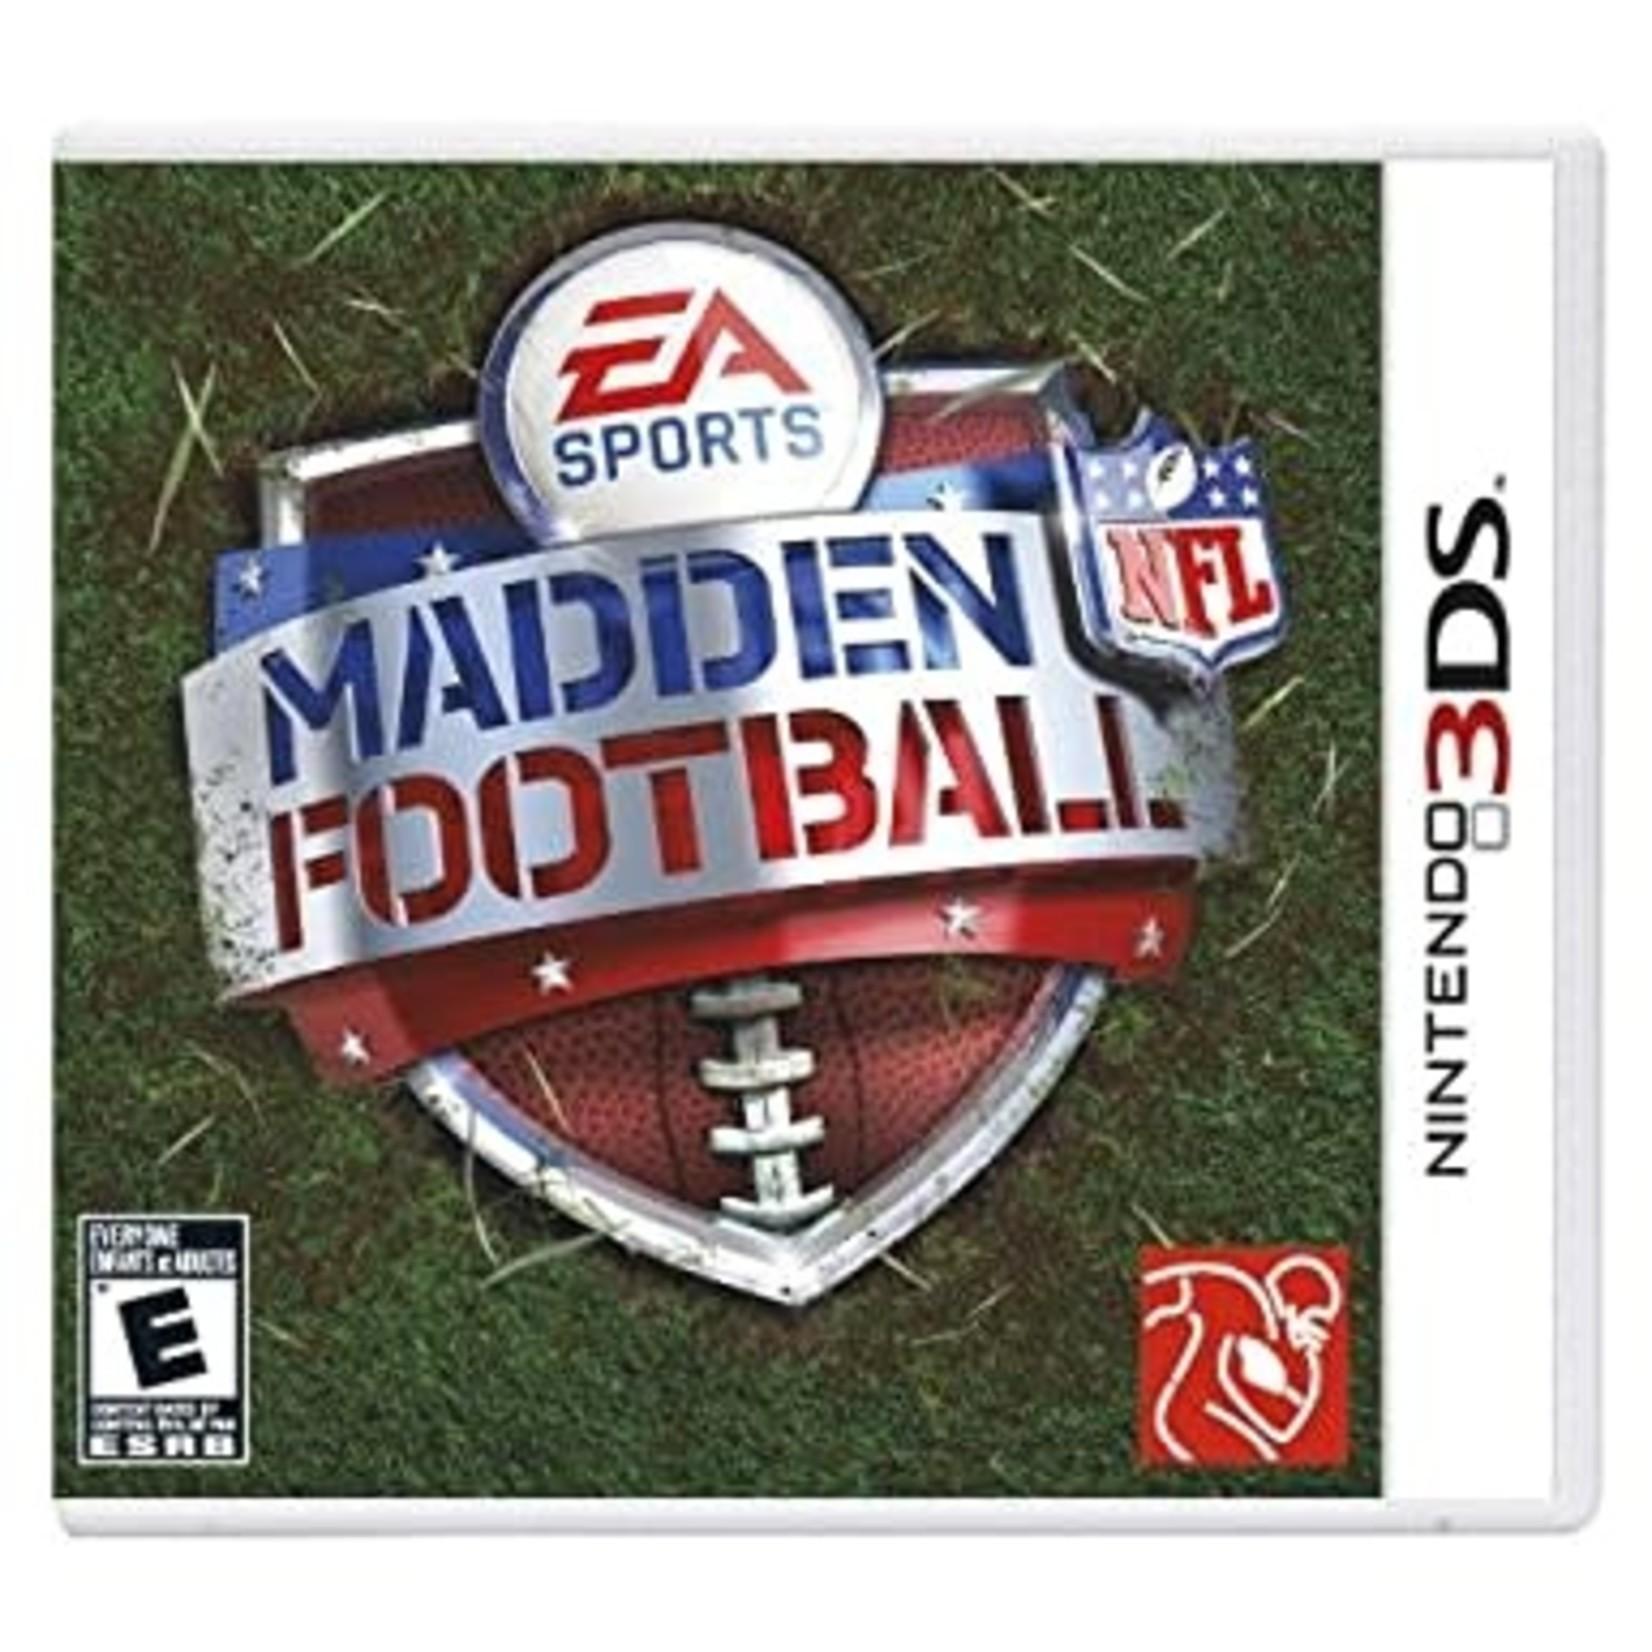 3DSU-Madden NFL Football